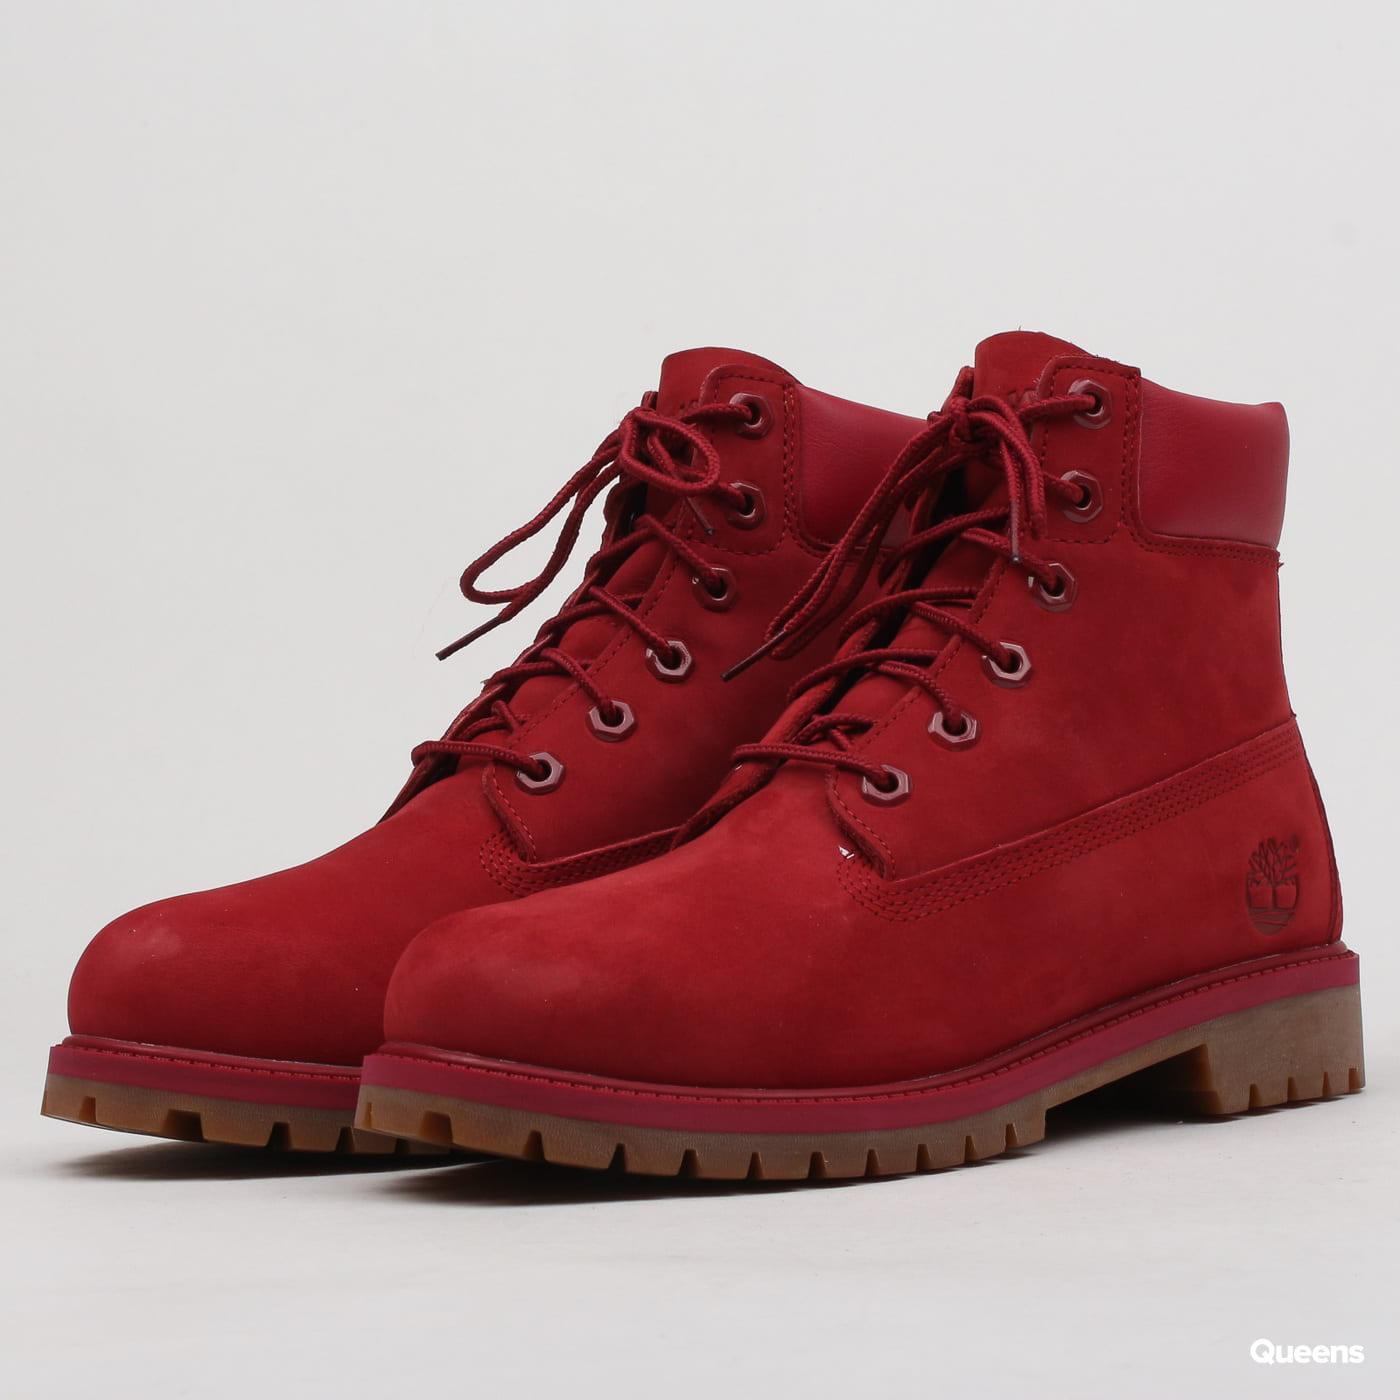 18f8e3a94 Dámska zimná obuv Timberland 6 Inch Premium WP Boot red (A13HV - RED) –  Queens 💚